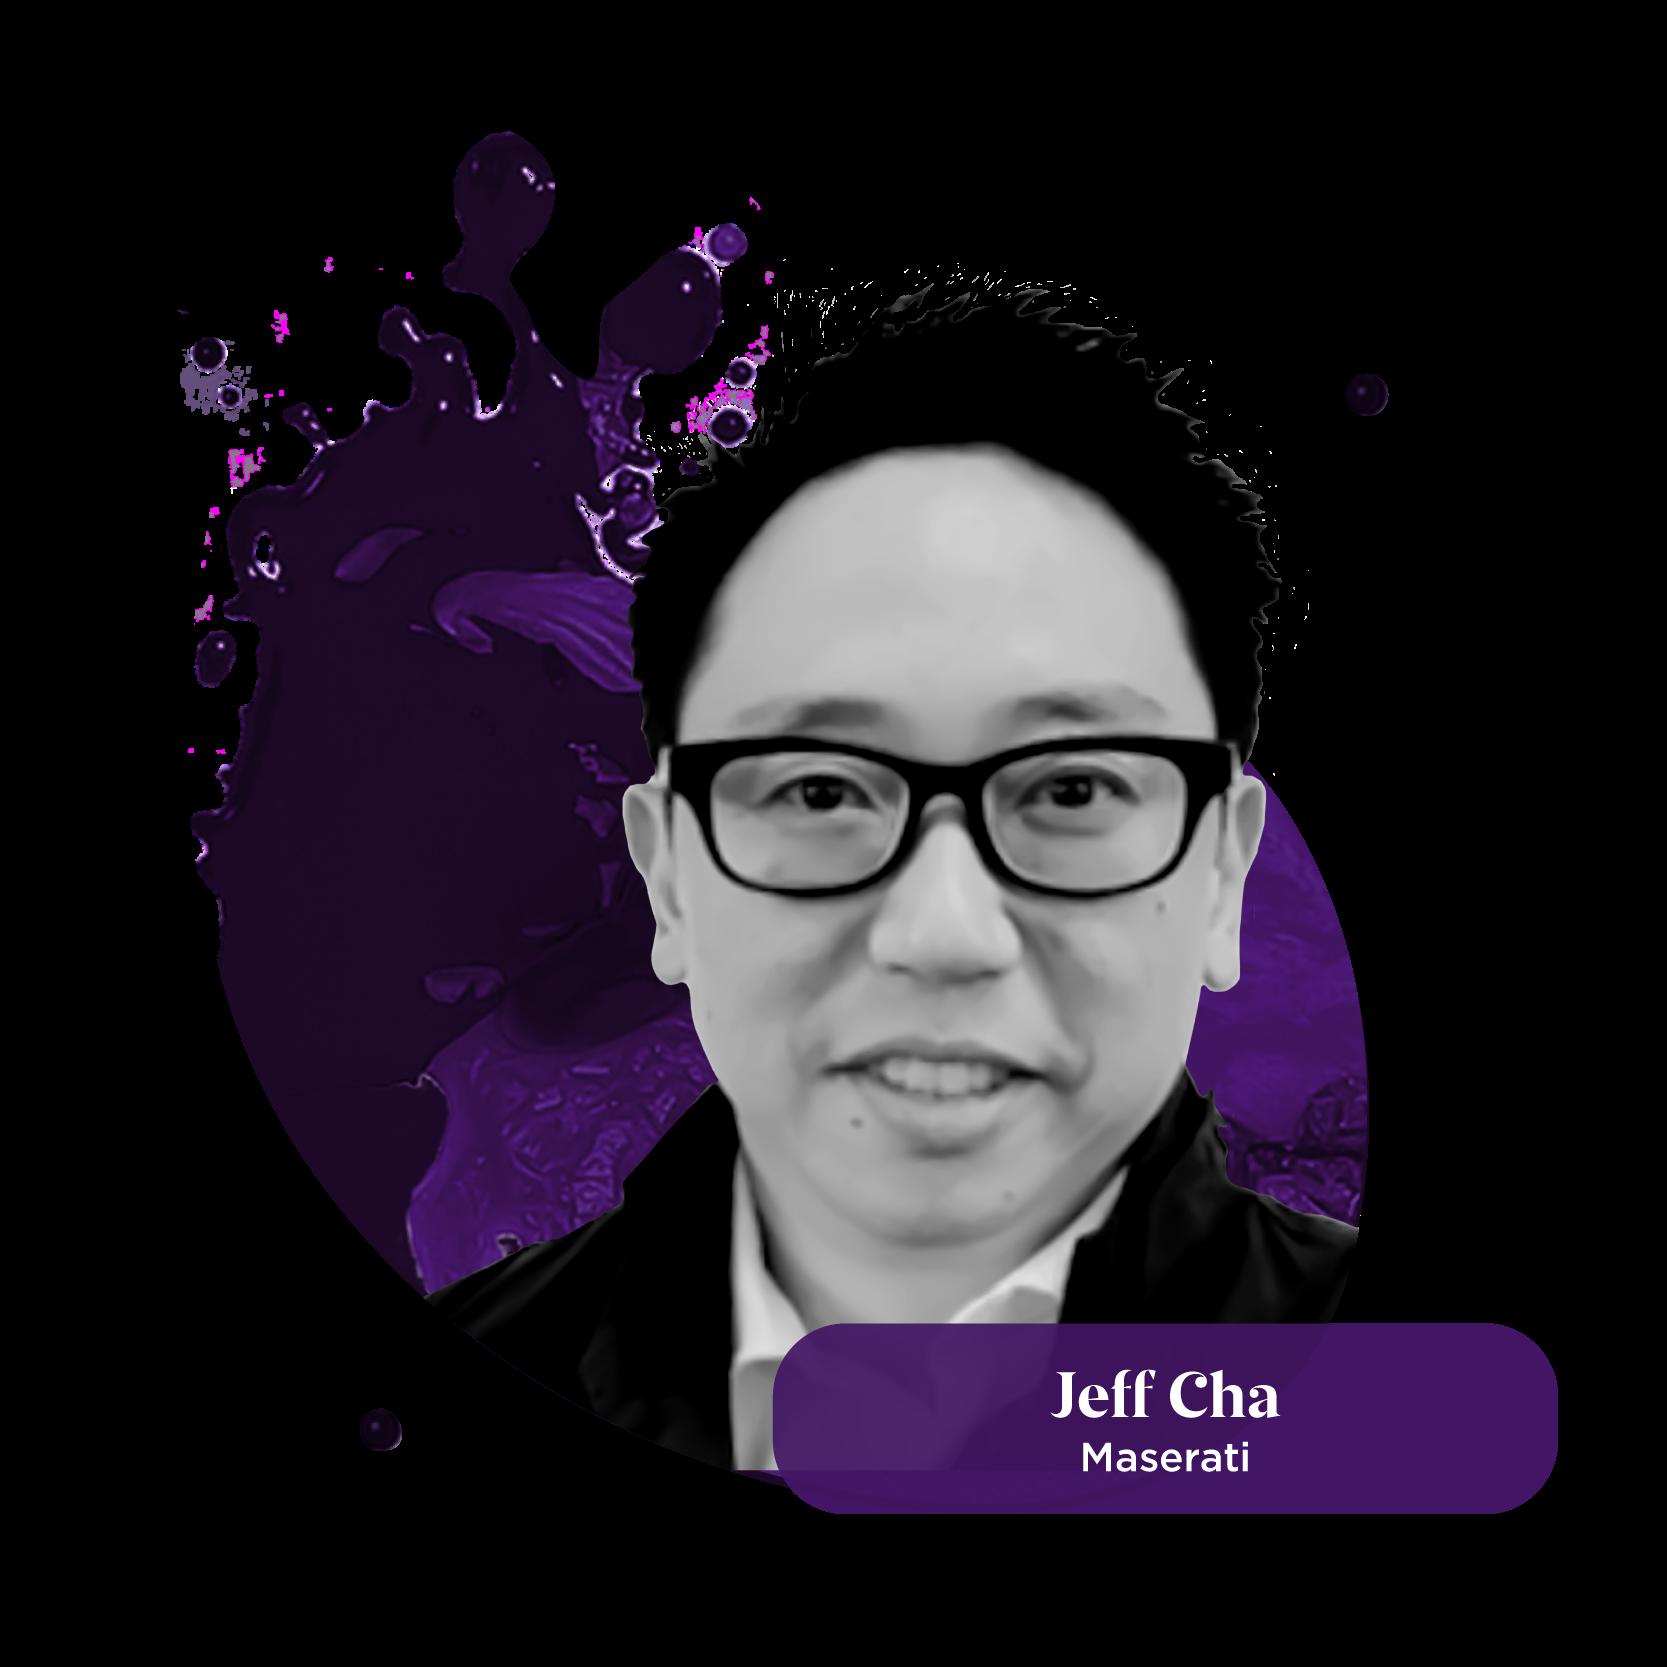 Jeff Cha